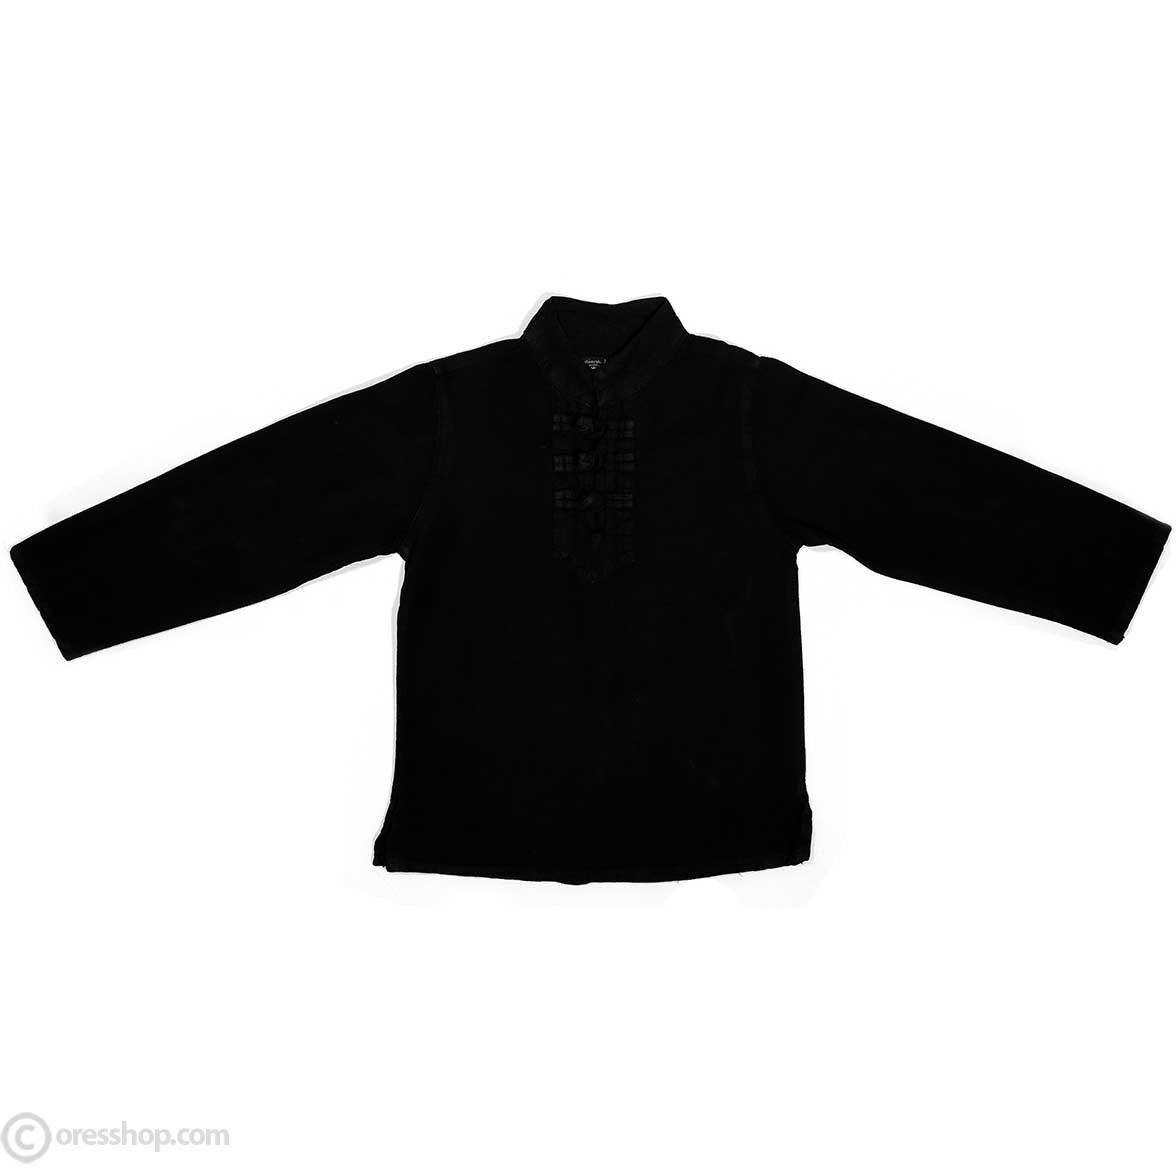 تصویر پیراهن پسرانه الیاف طبیعی مشکی